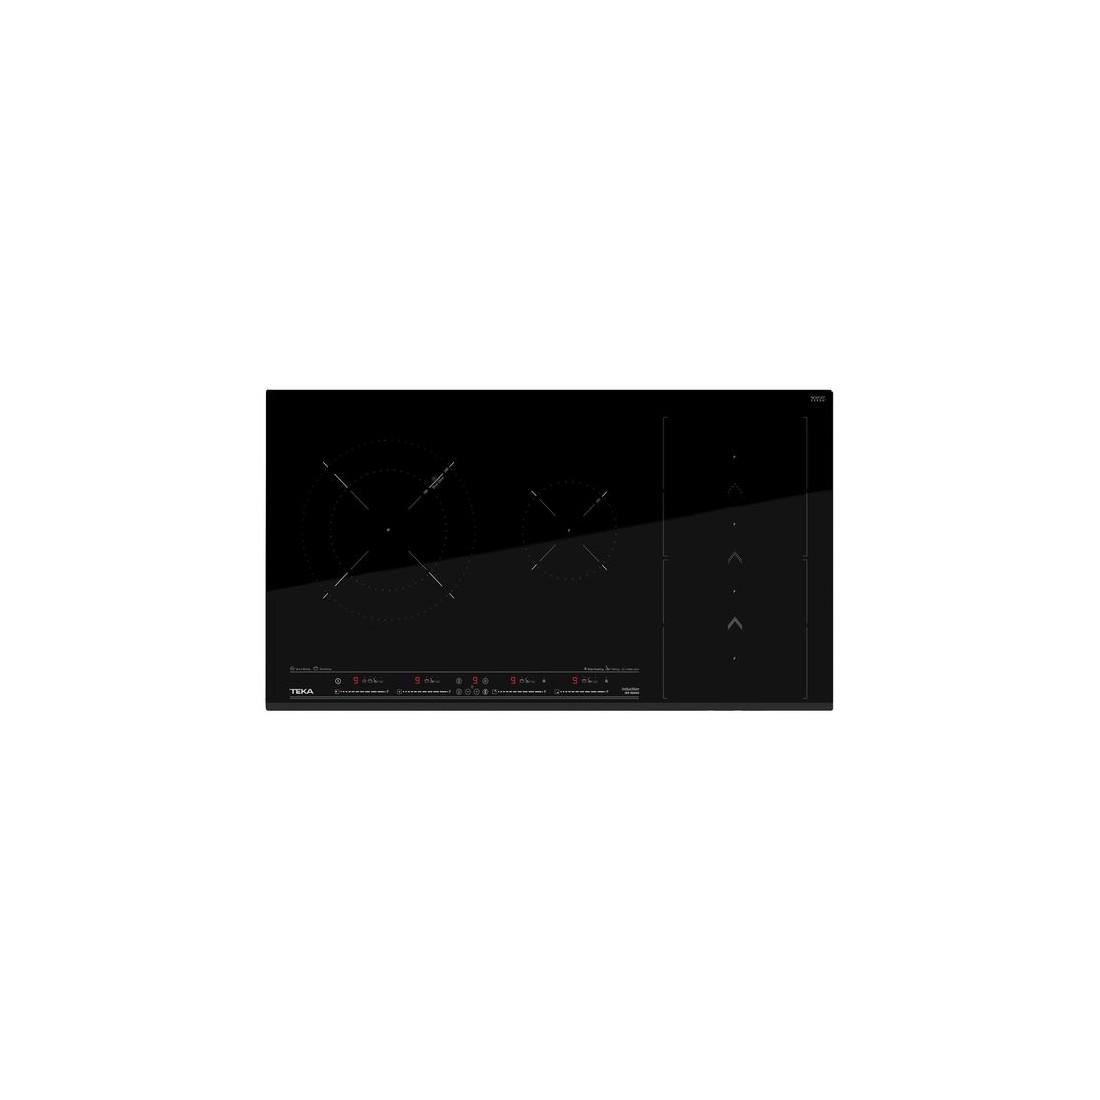 Placa Flexinducción - Teka Slide IZS96600, 90 cm